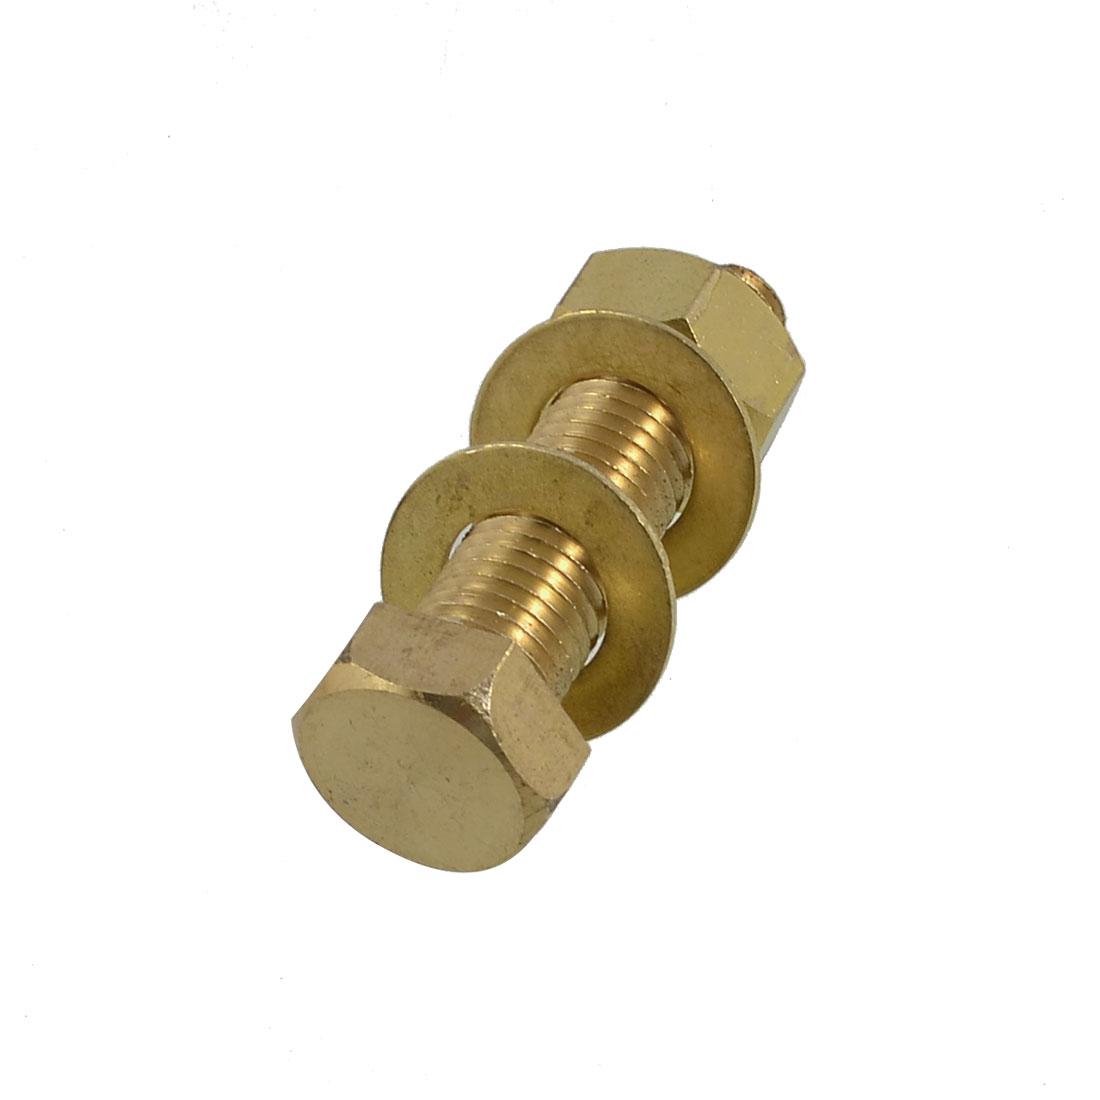 Brass 16mm x 60mm Male Thread Hex Head Screw Bolt Nut Washer Set